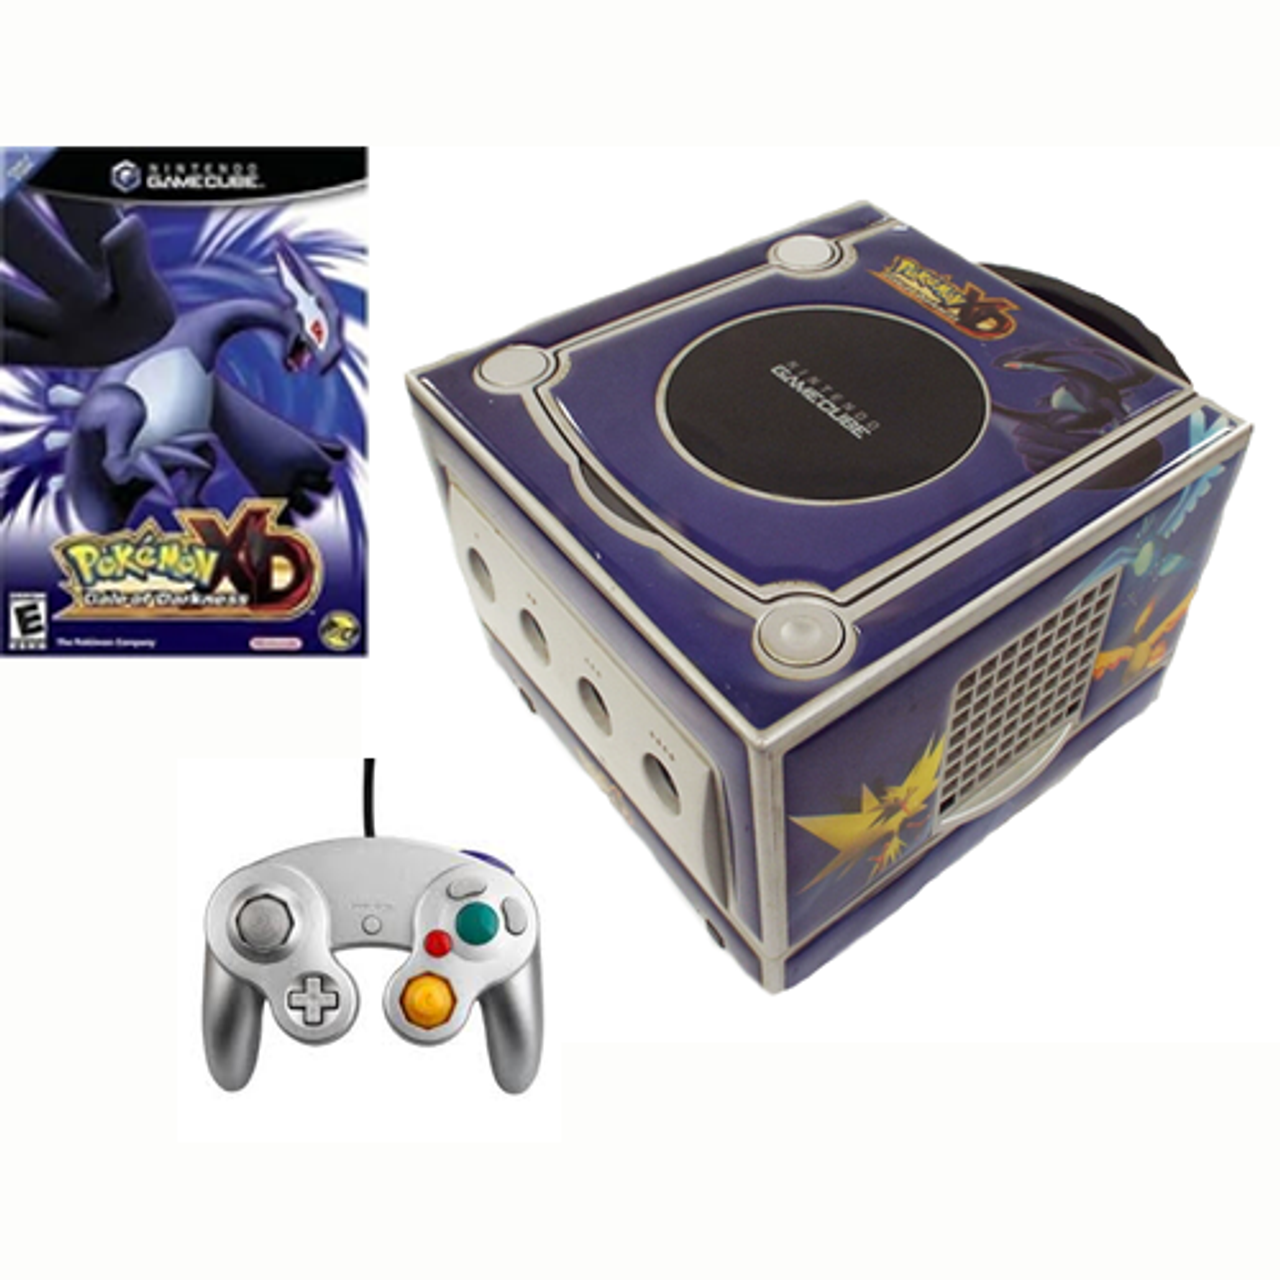 Nintendo gamecube pokemon xd skin bundle player pak for sale - Gamecube pokemon xd console ...